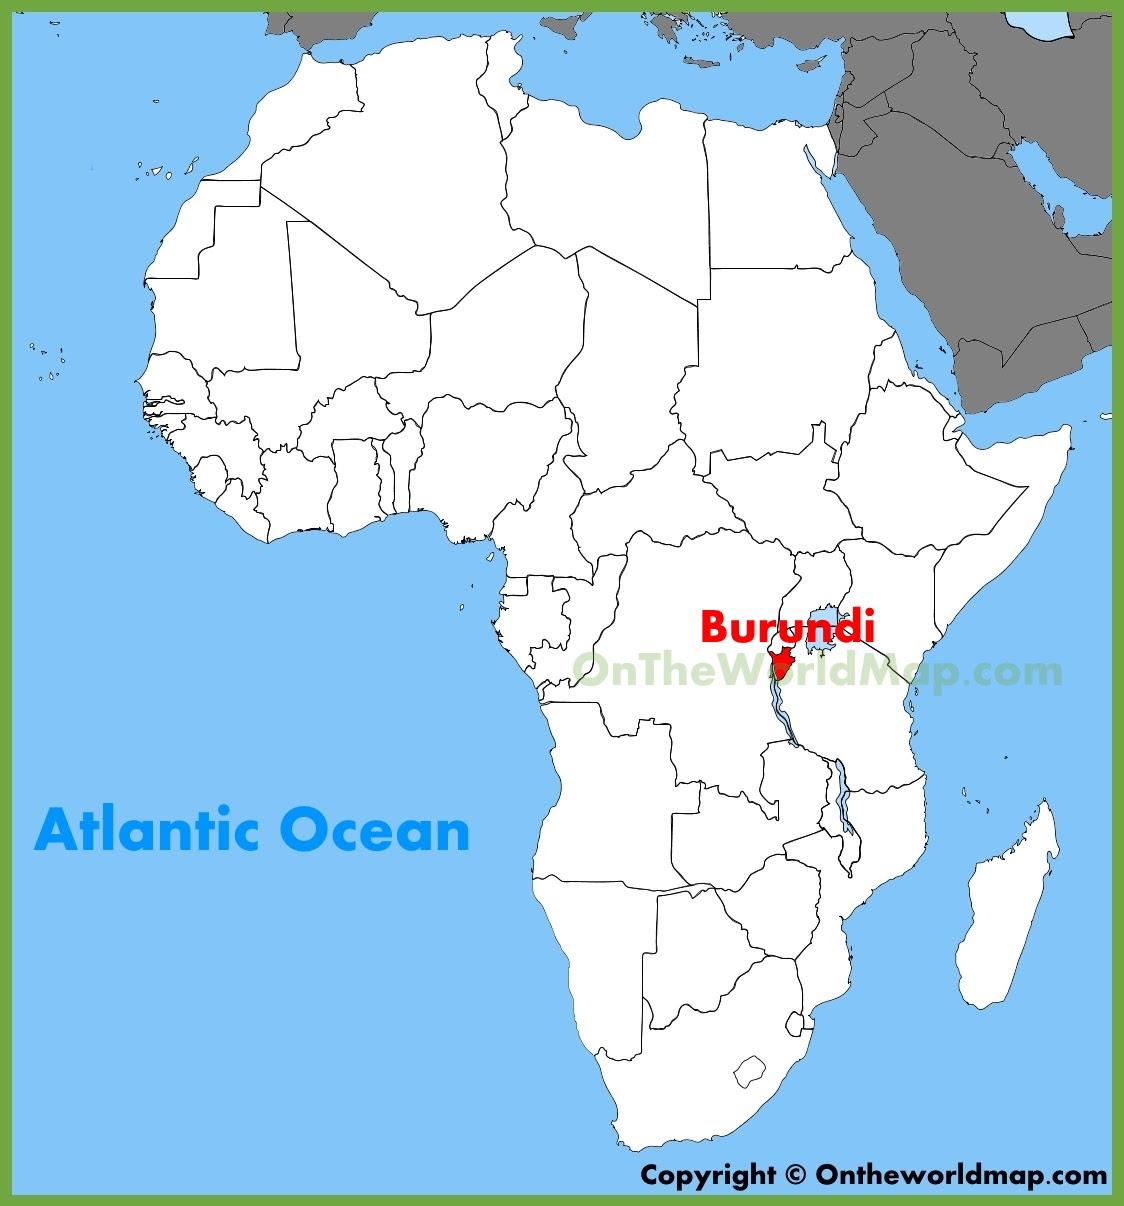 Burundi On The Map Of Africa Jungle Maps: Map Of Africa Burundi